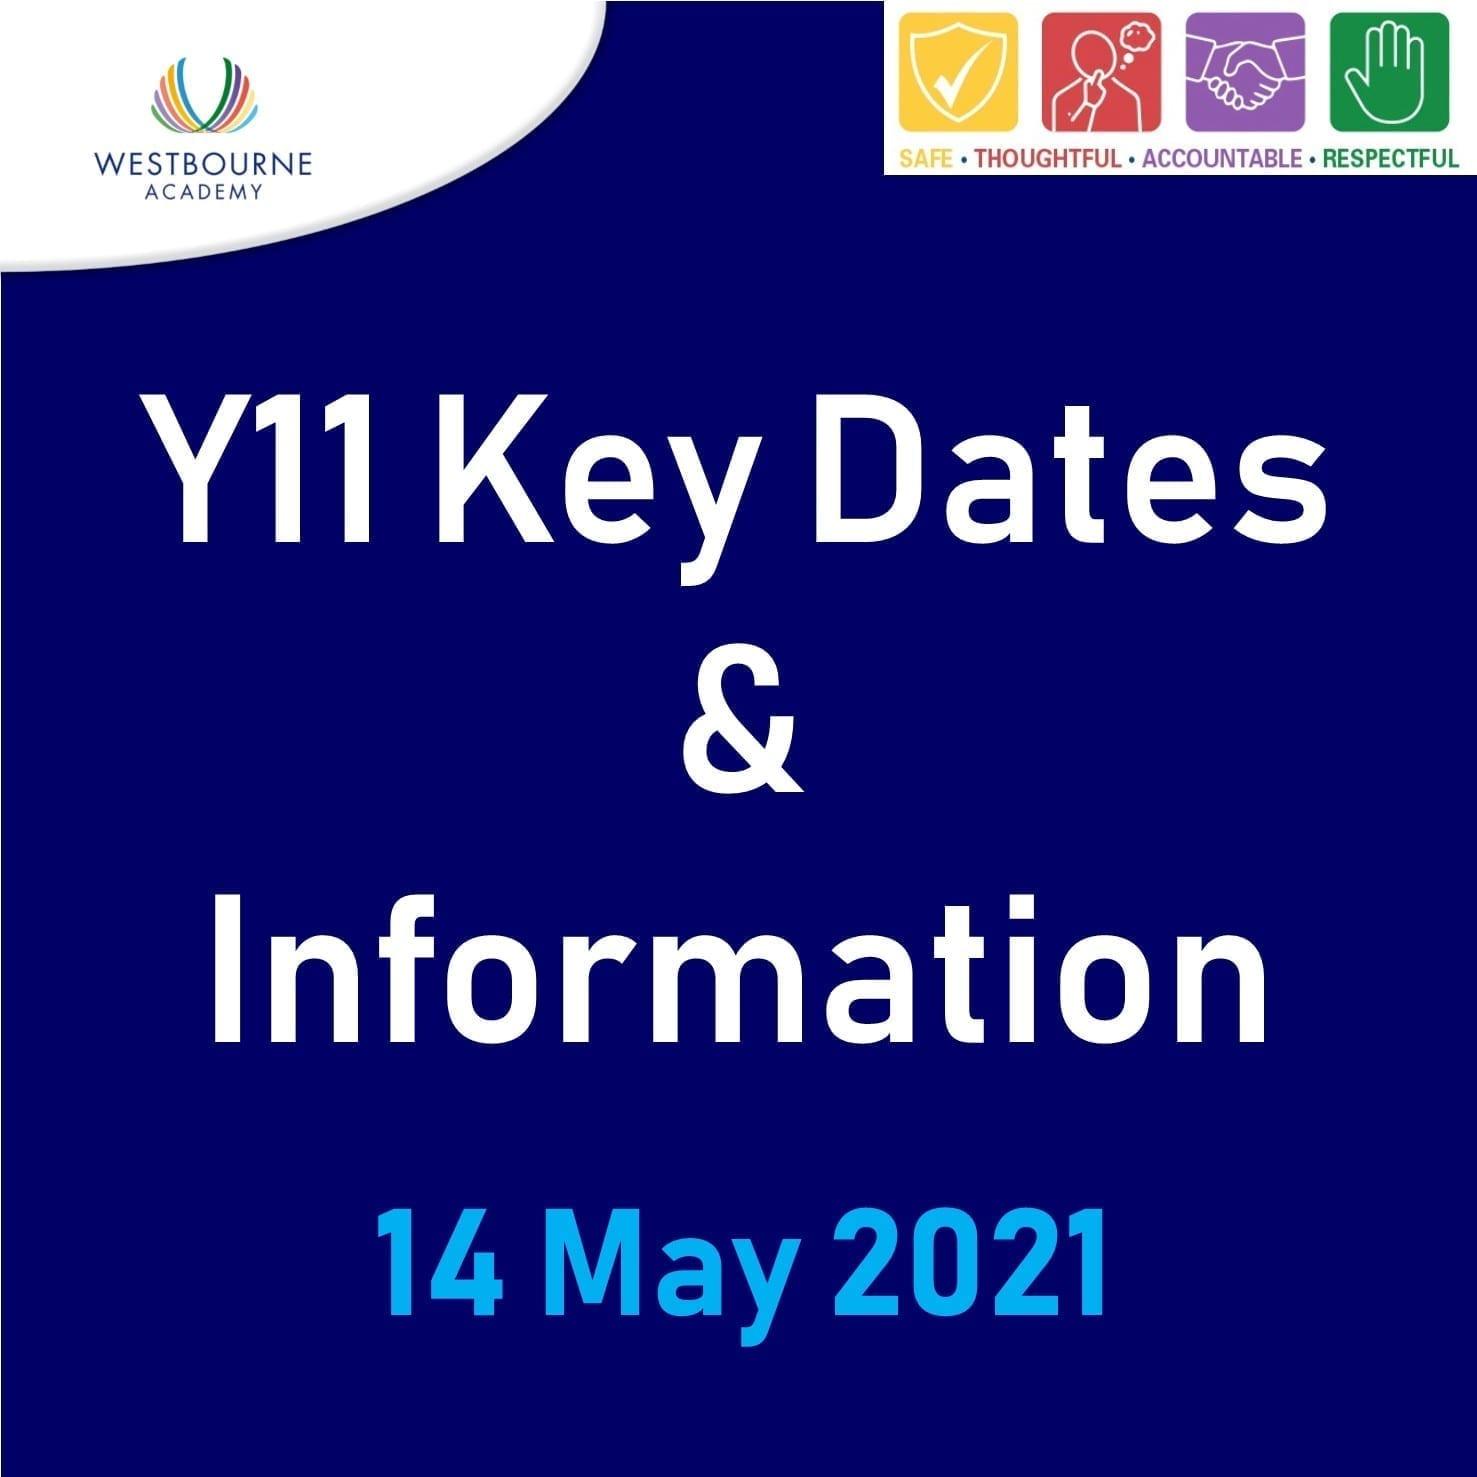 Y11 Key Dates & Information 14MAY21